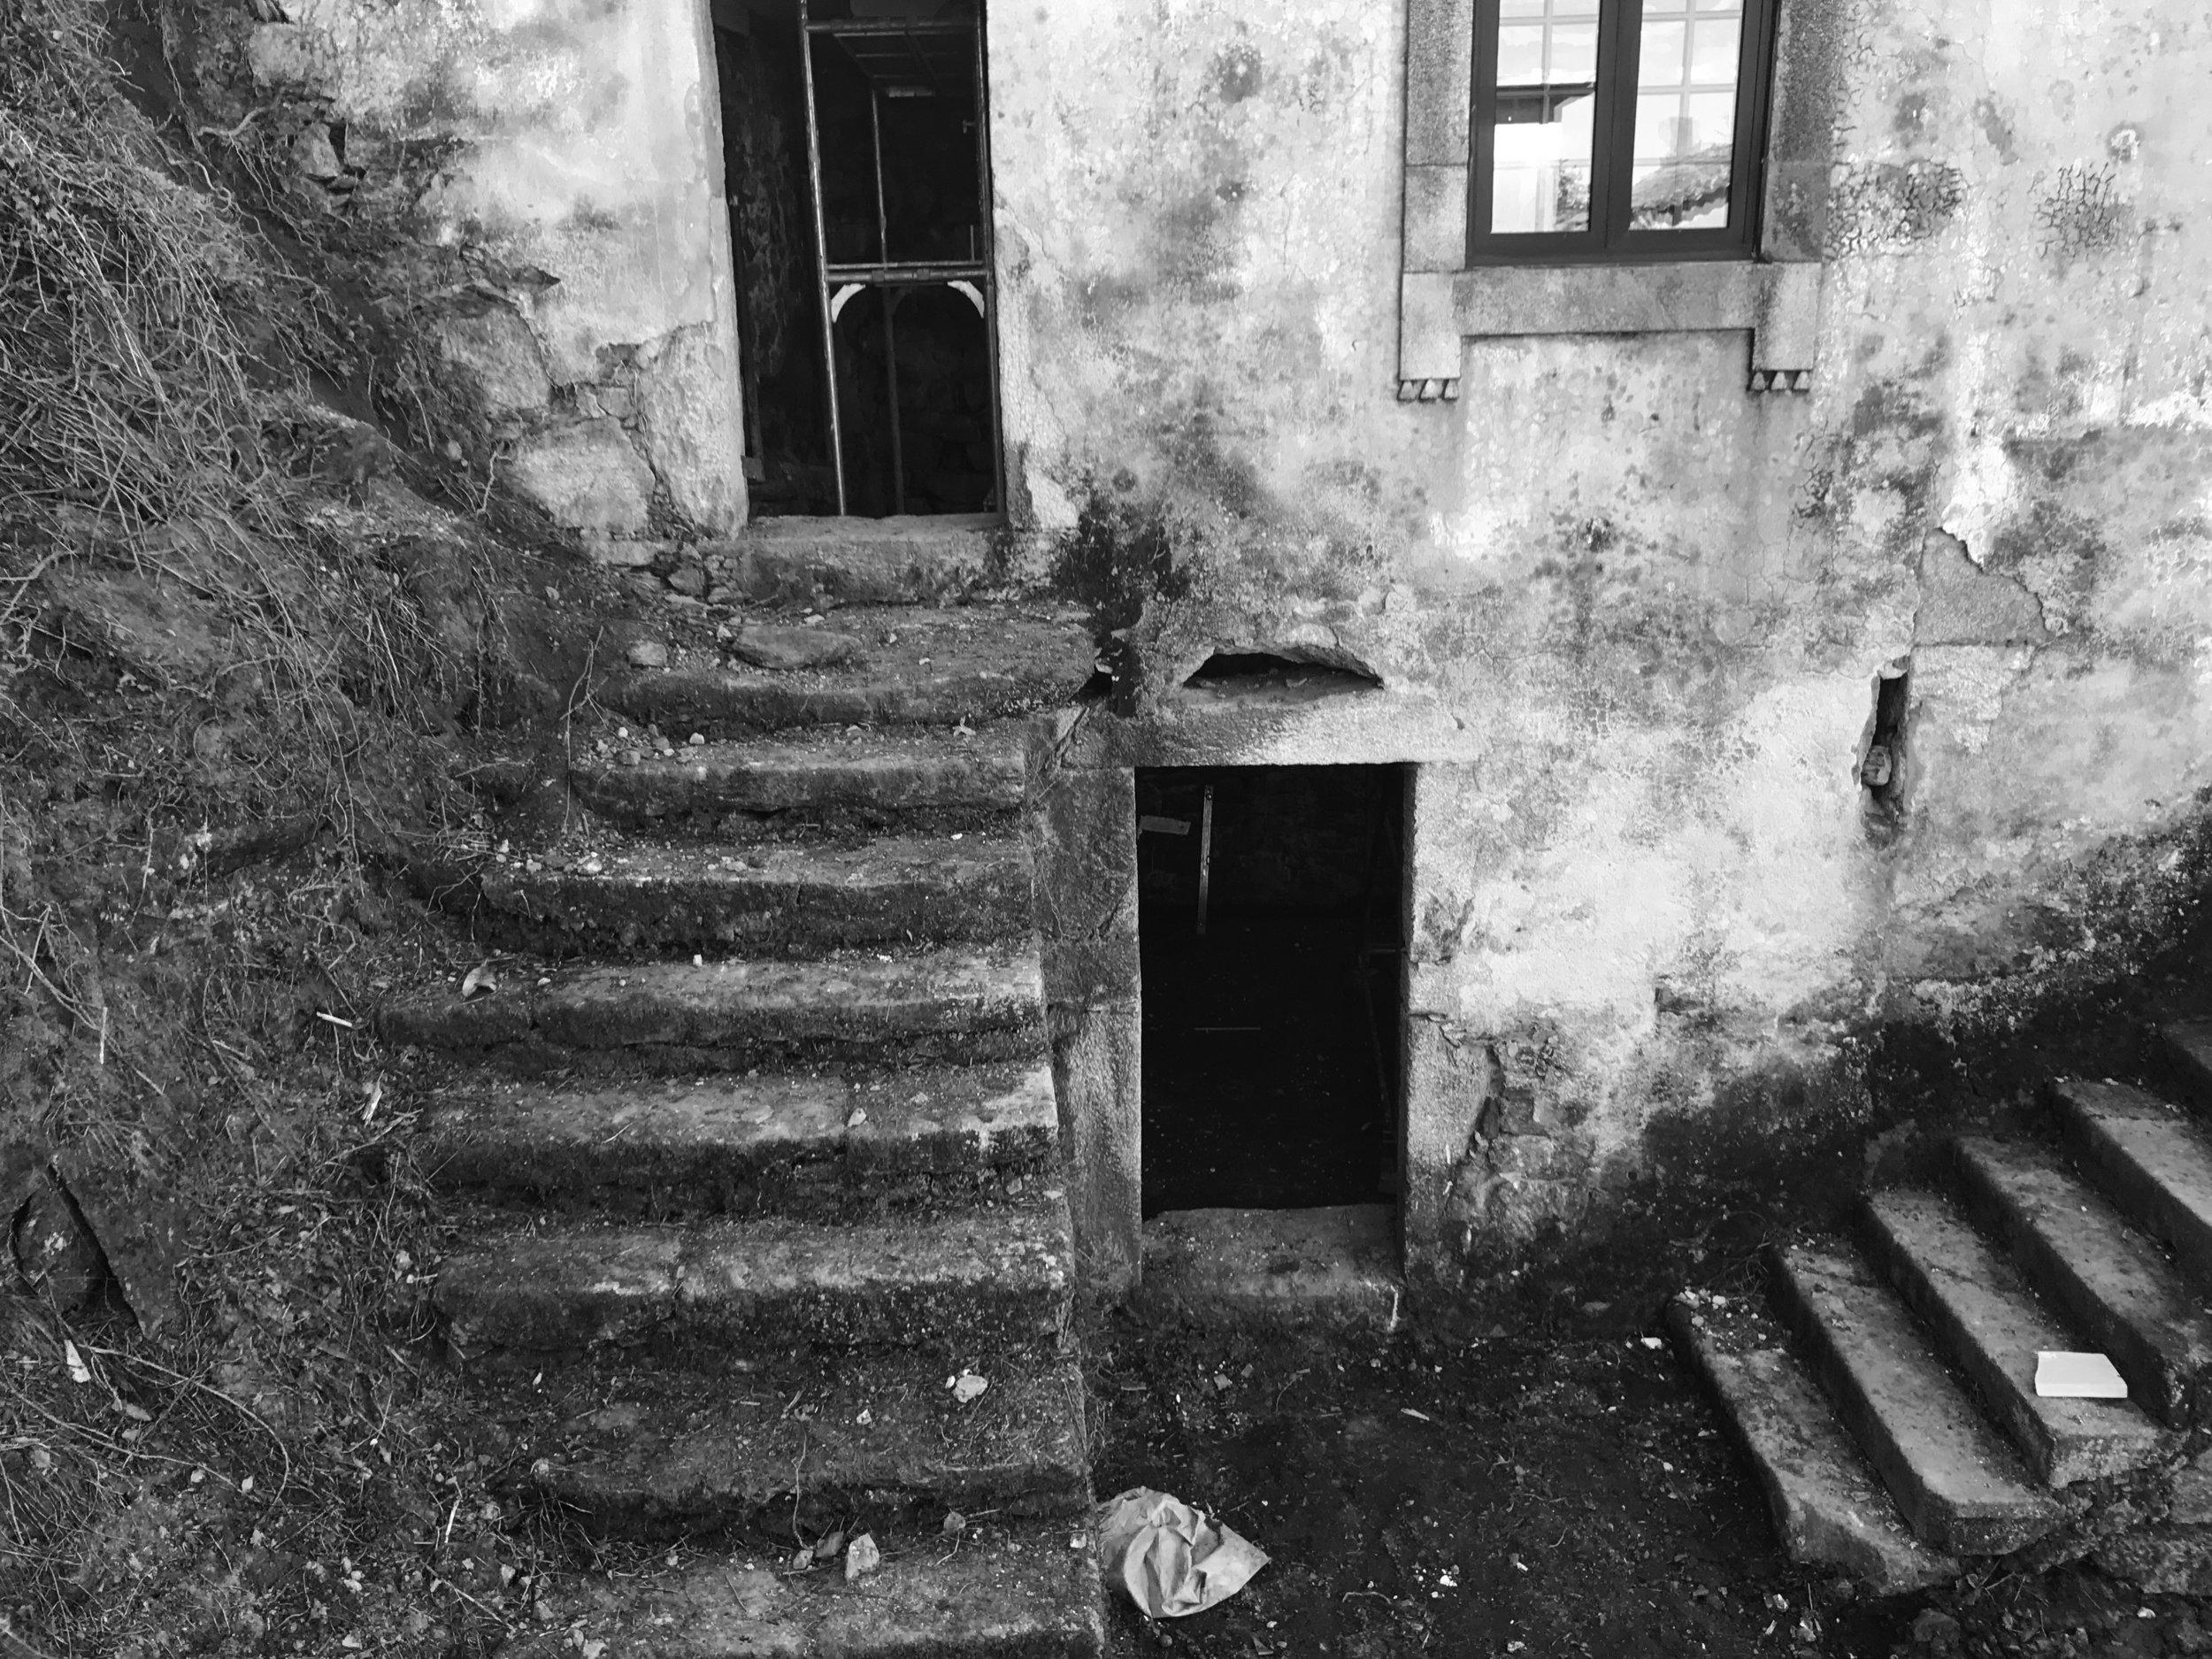 Moradia Folgorosa - Vale de Cambra - EVA atelier - Arquitectura - Obra - Arquitecto - Porto - EVA evolutionary architecture (17).jpg